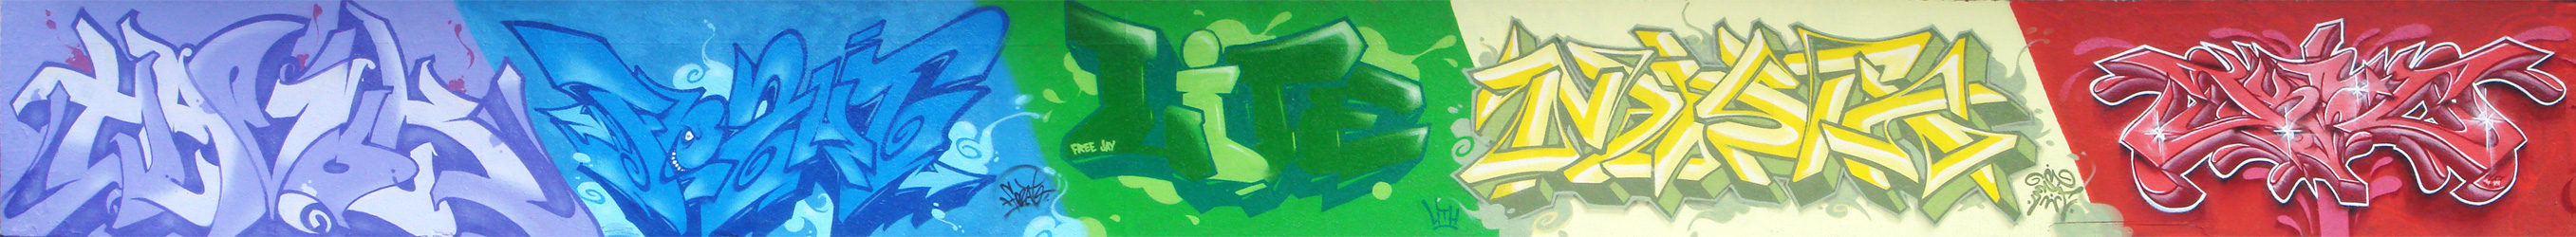 CA. Crayola by Fezat1